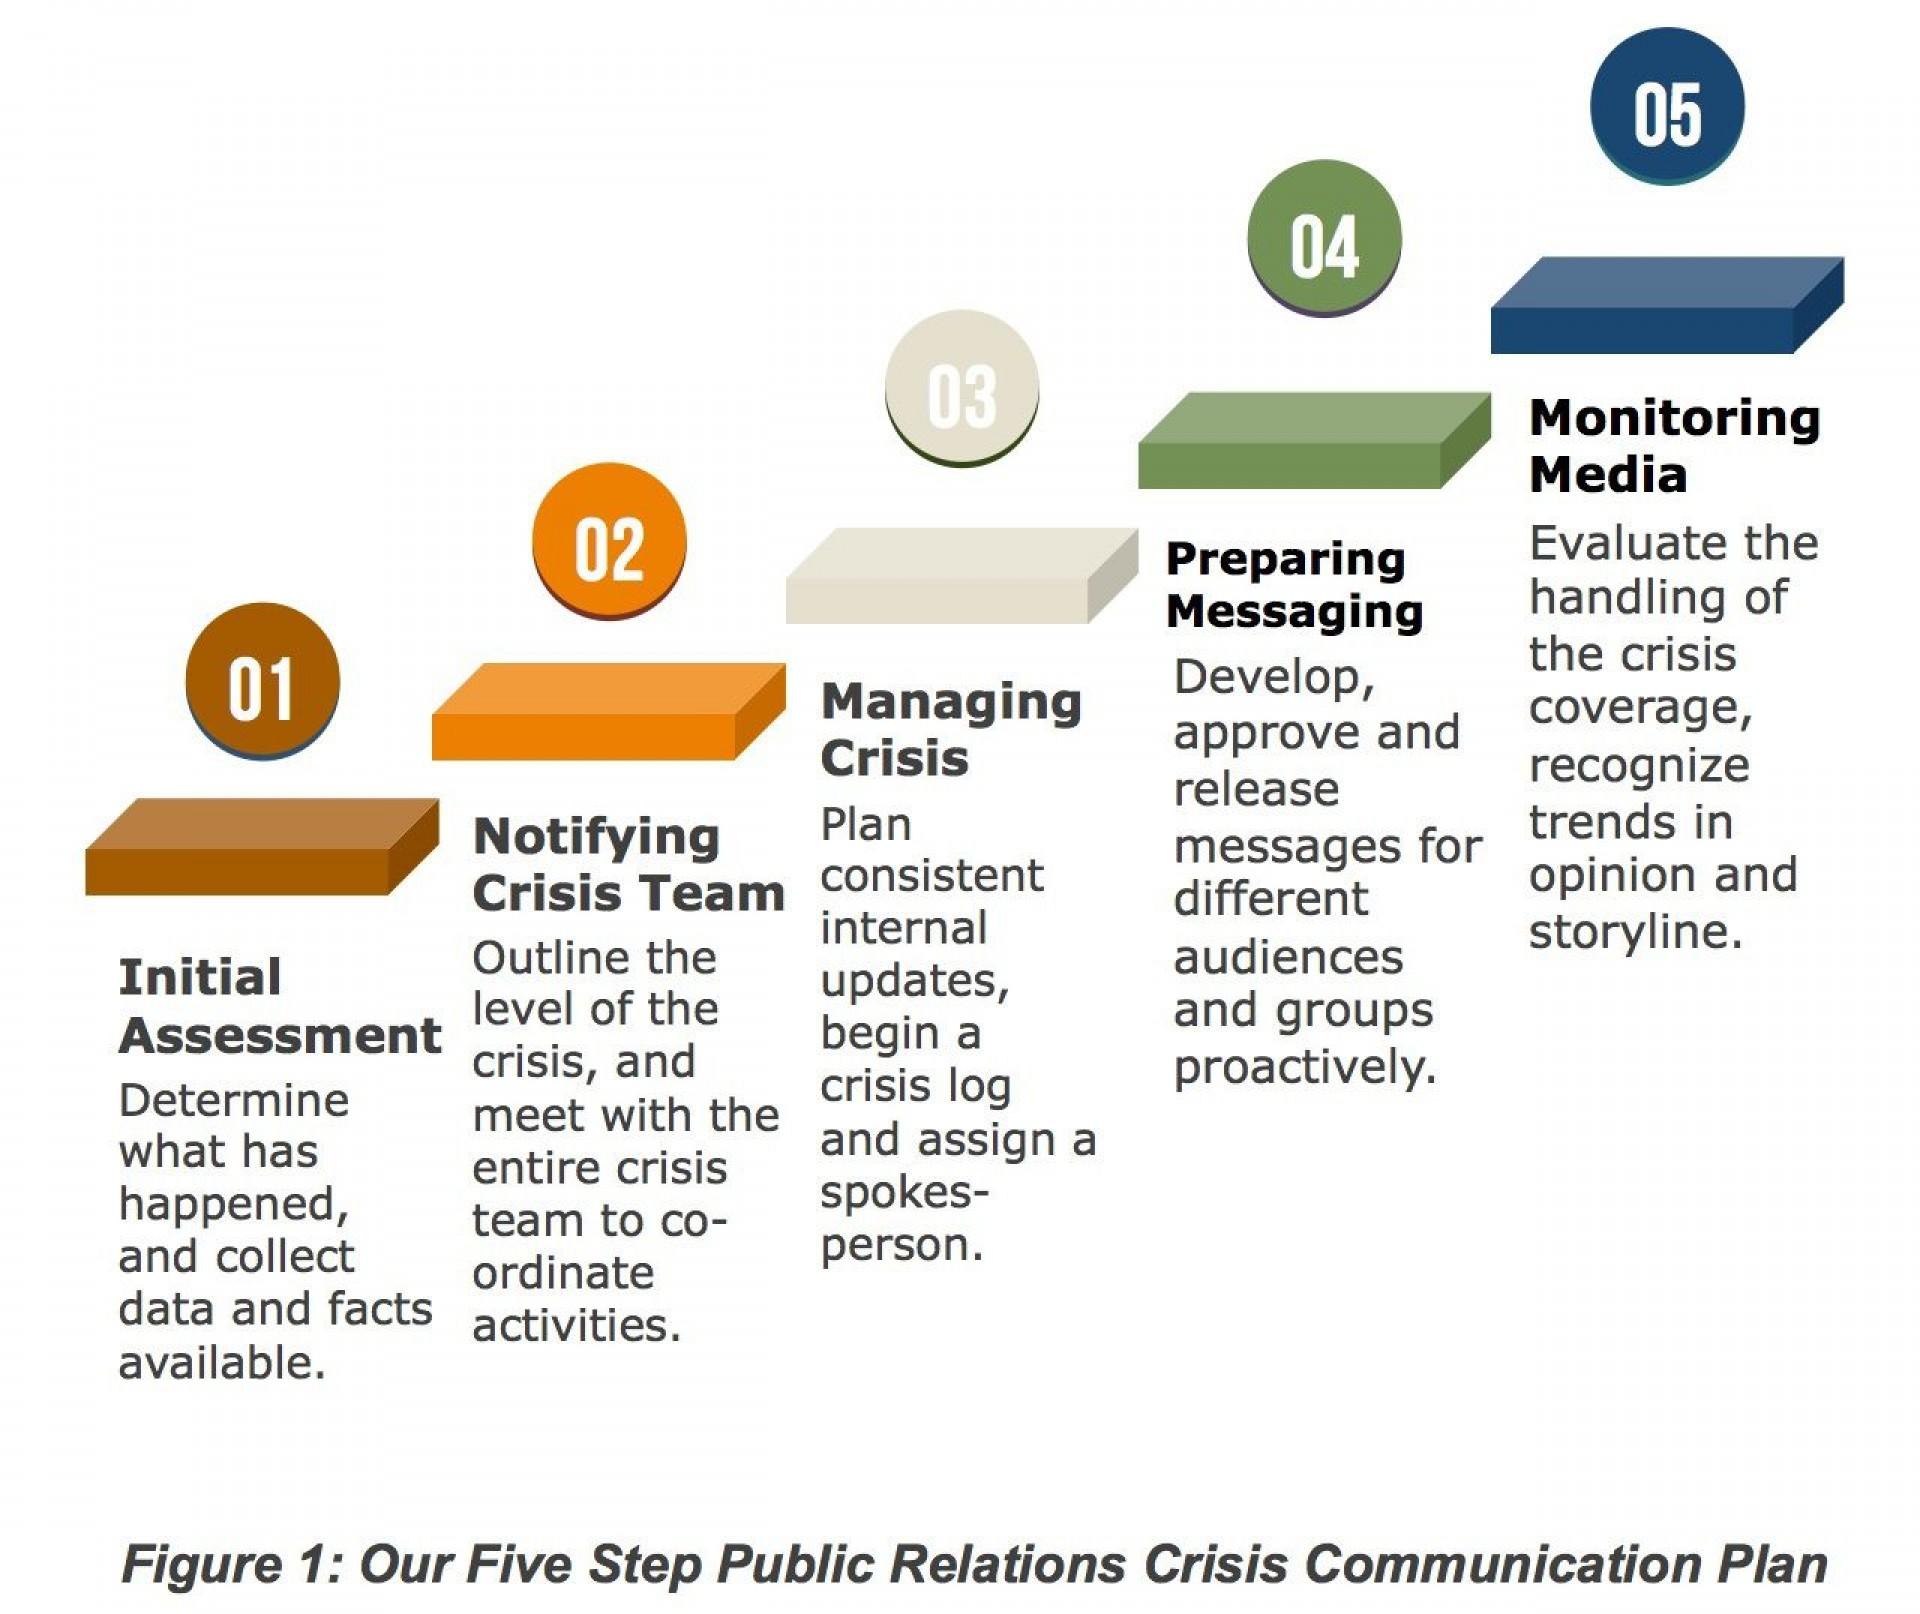 001 Astounding Crisi Communication Plan Template Idea  For Higher Education Nonprofit1920